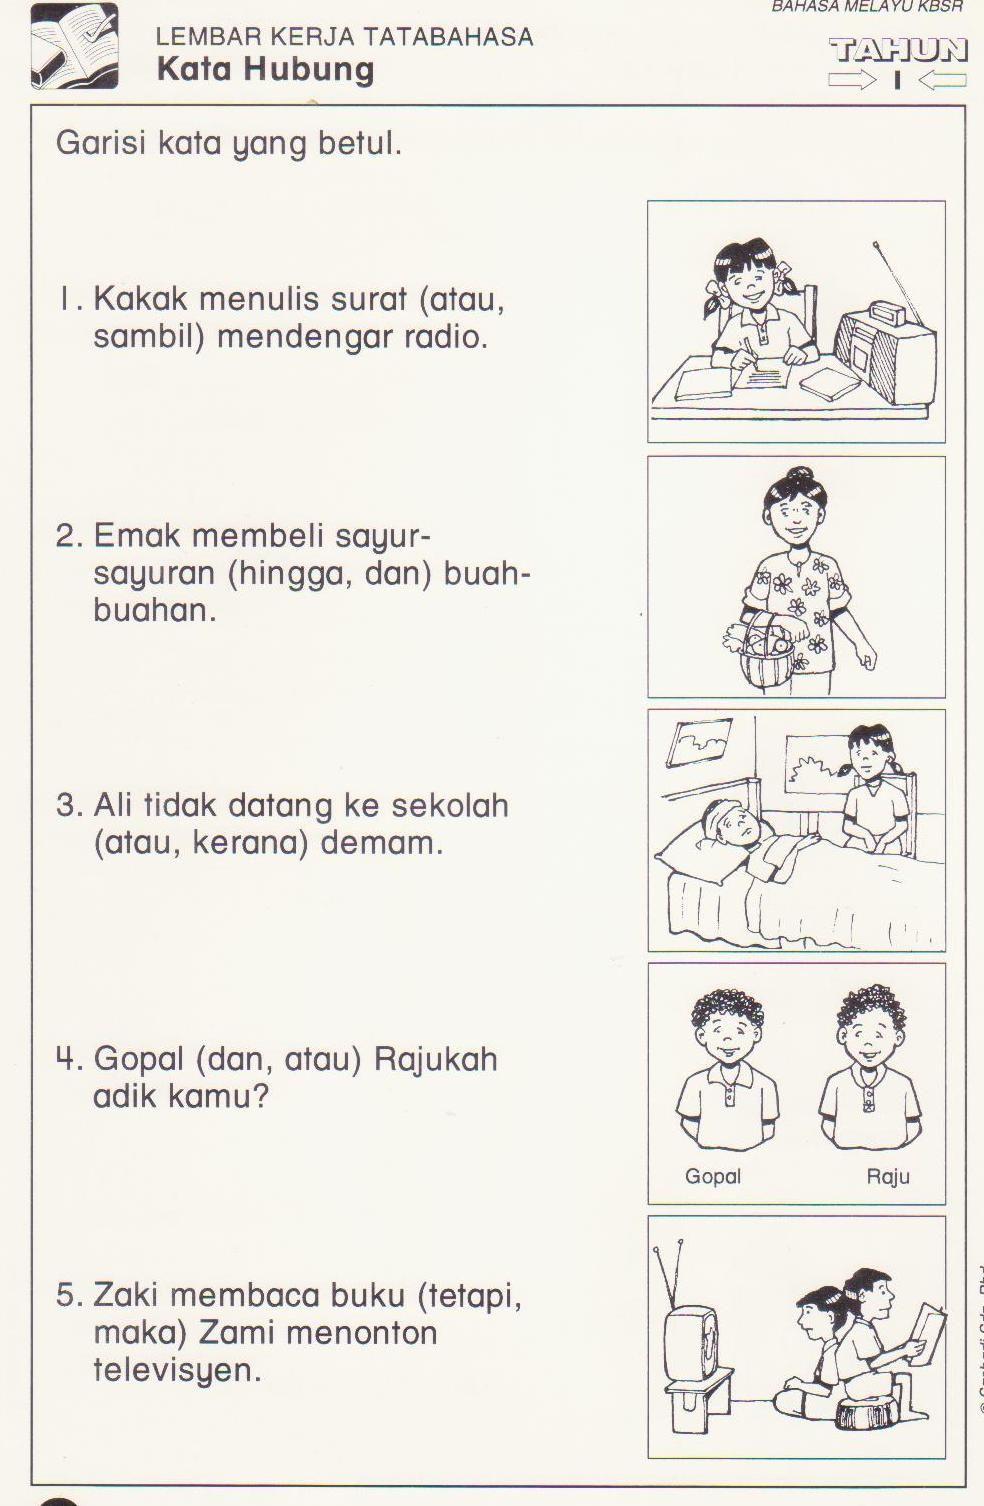 Latihan Kata Hubung 3 Jpg 984 1 506 Pixels Preschool Learning Activities Tutoring Business Malay Language